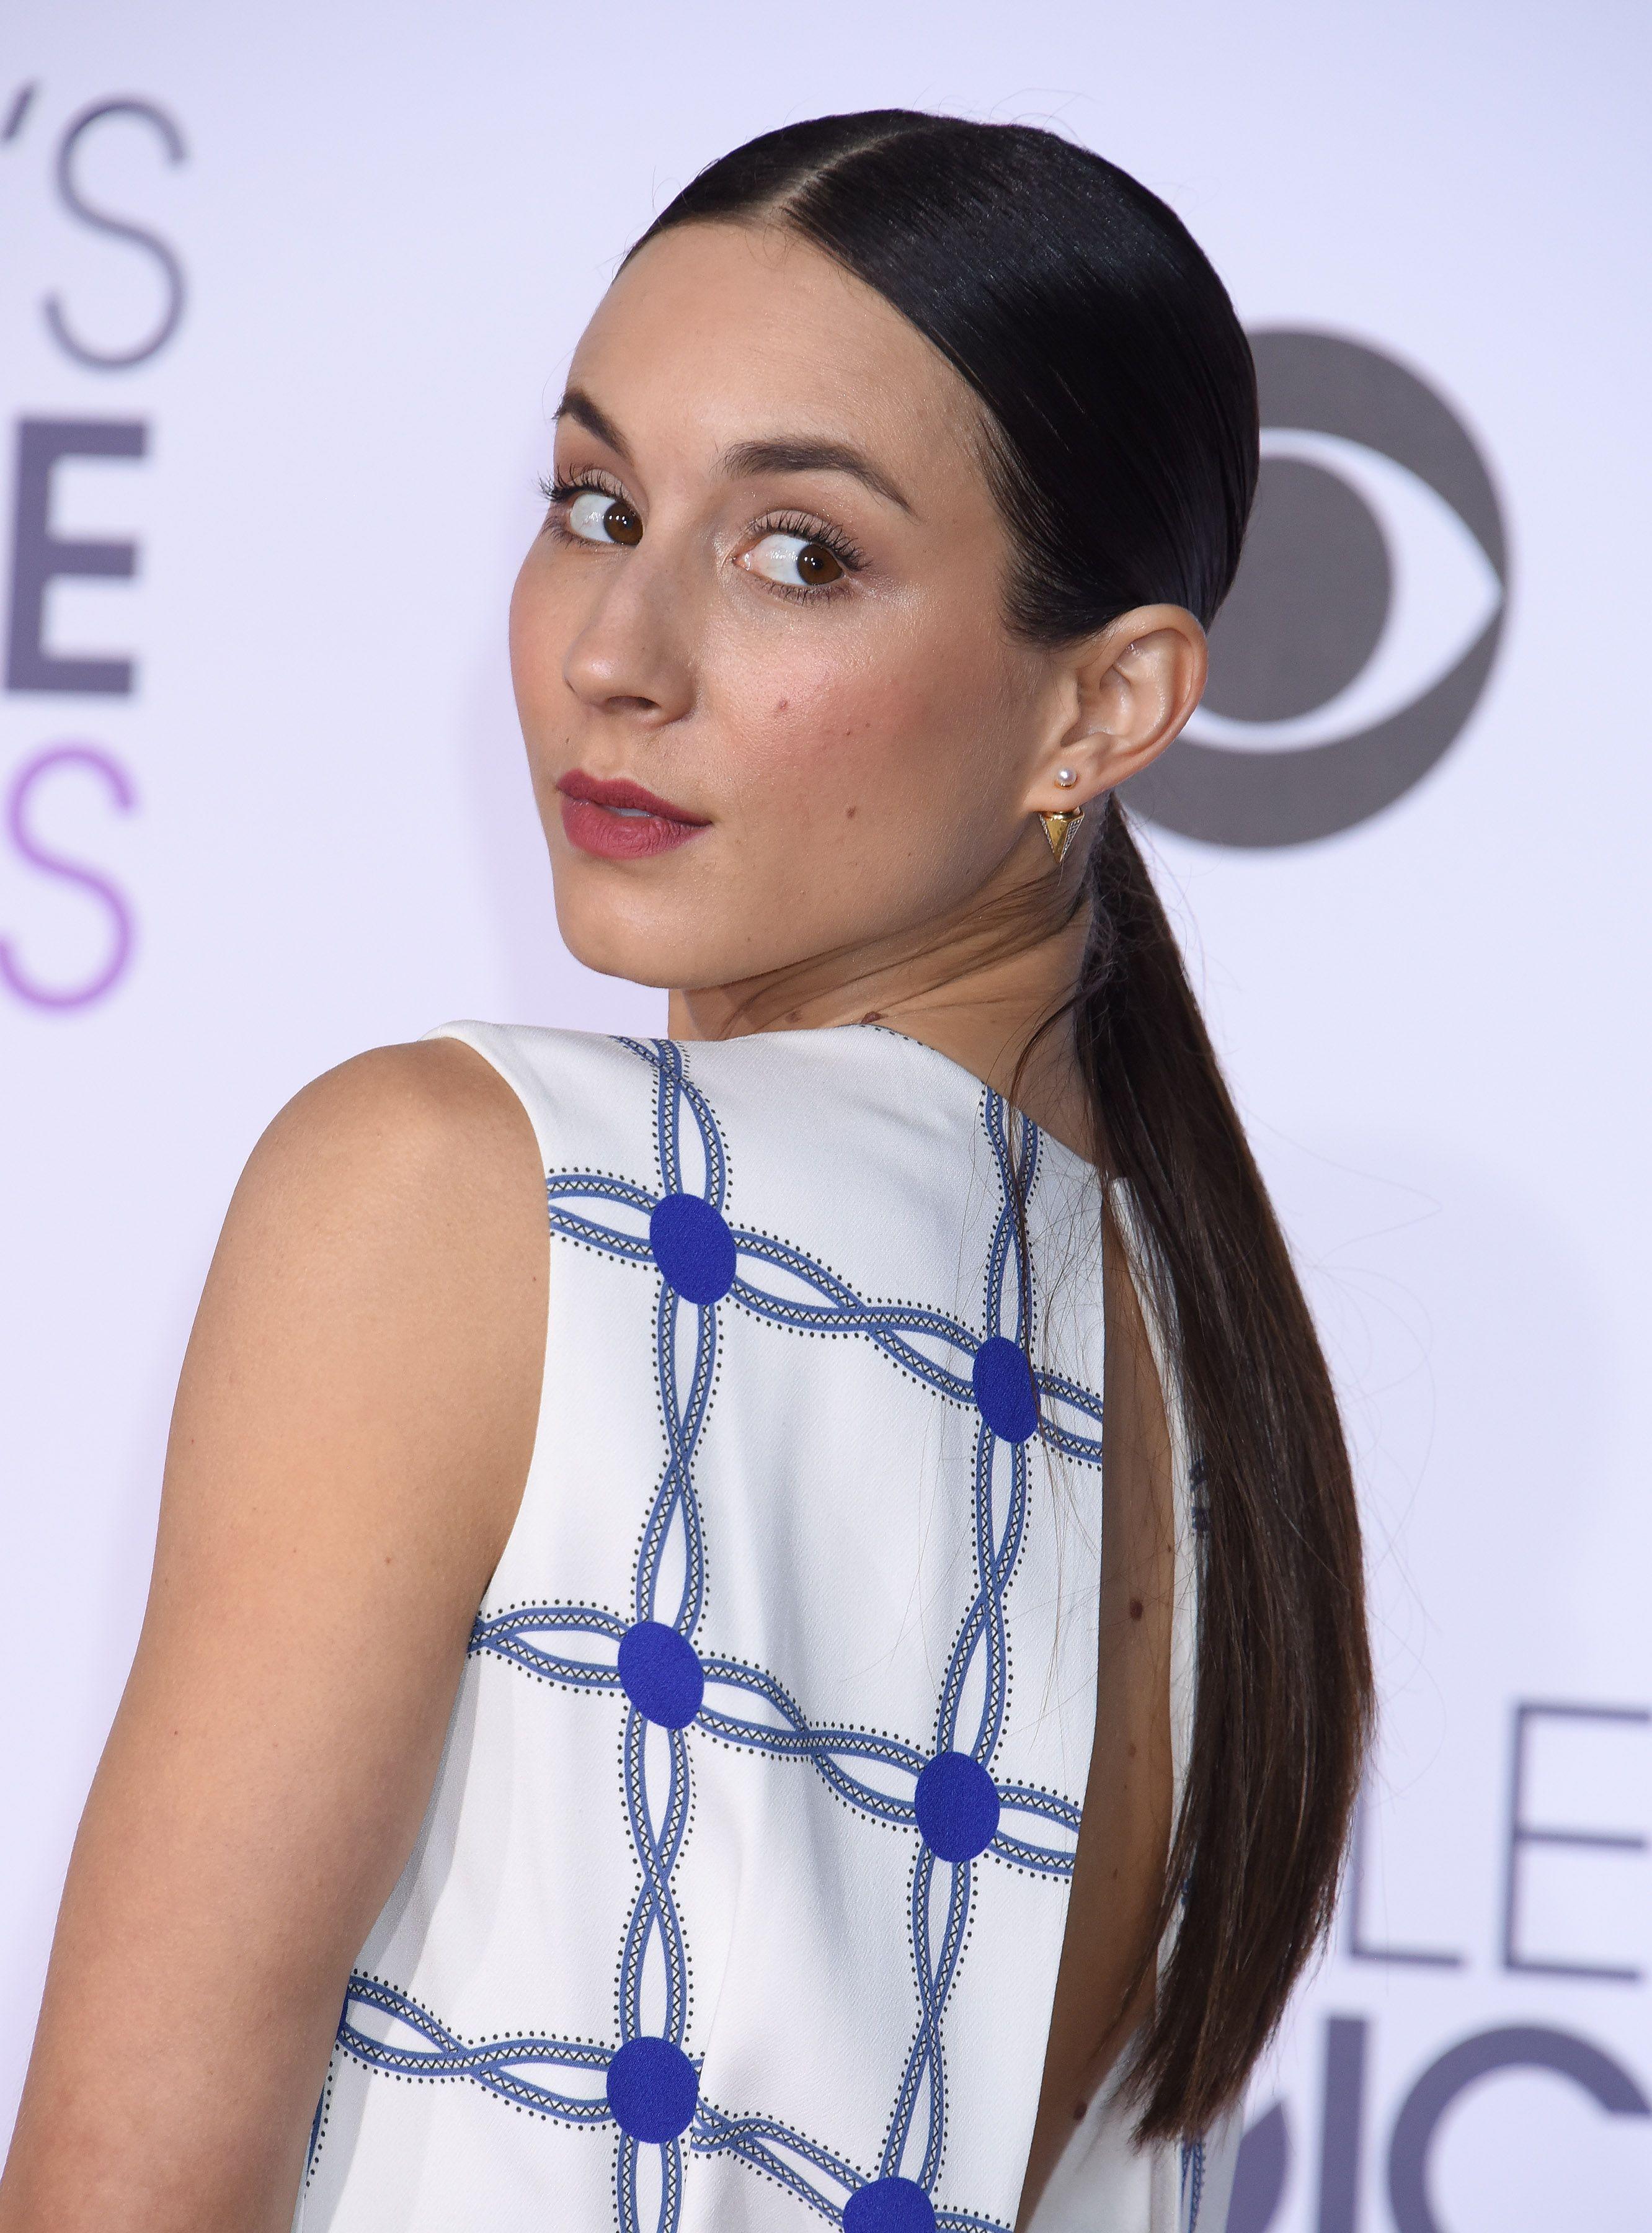 Troian Bellisario - her skin care secrets at http://skincaretips.pro